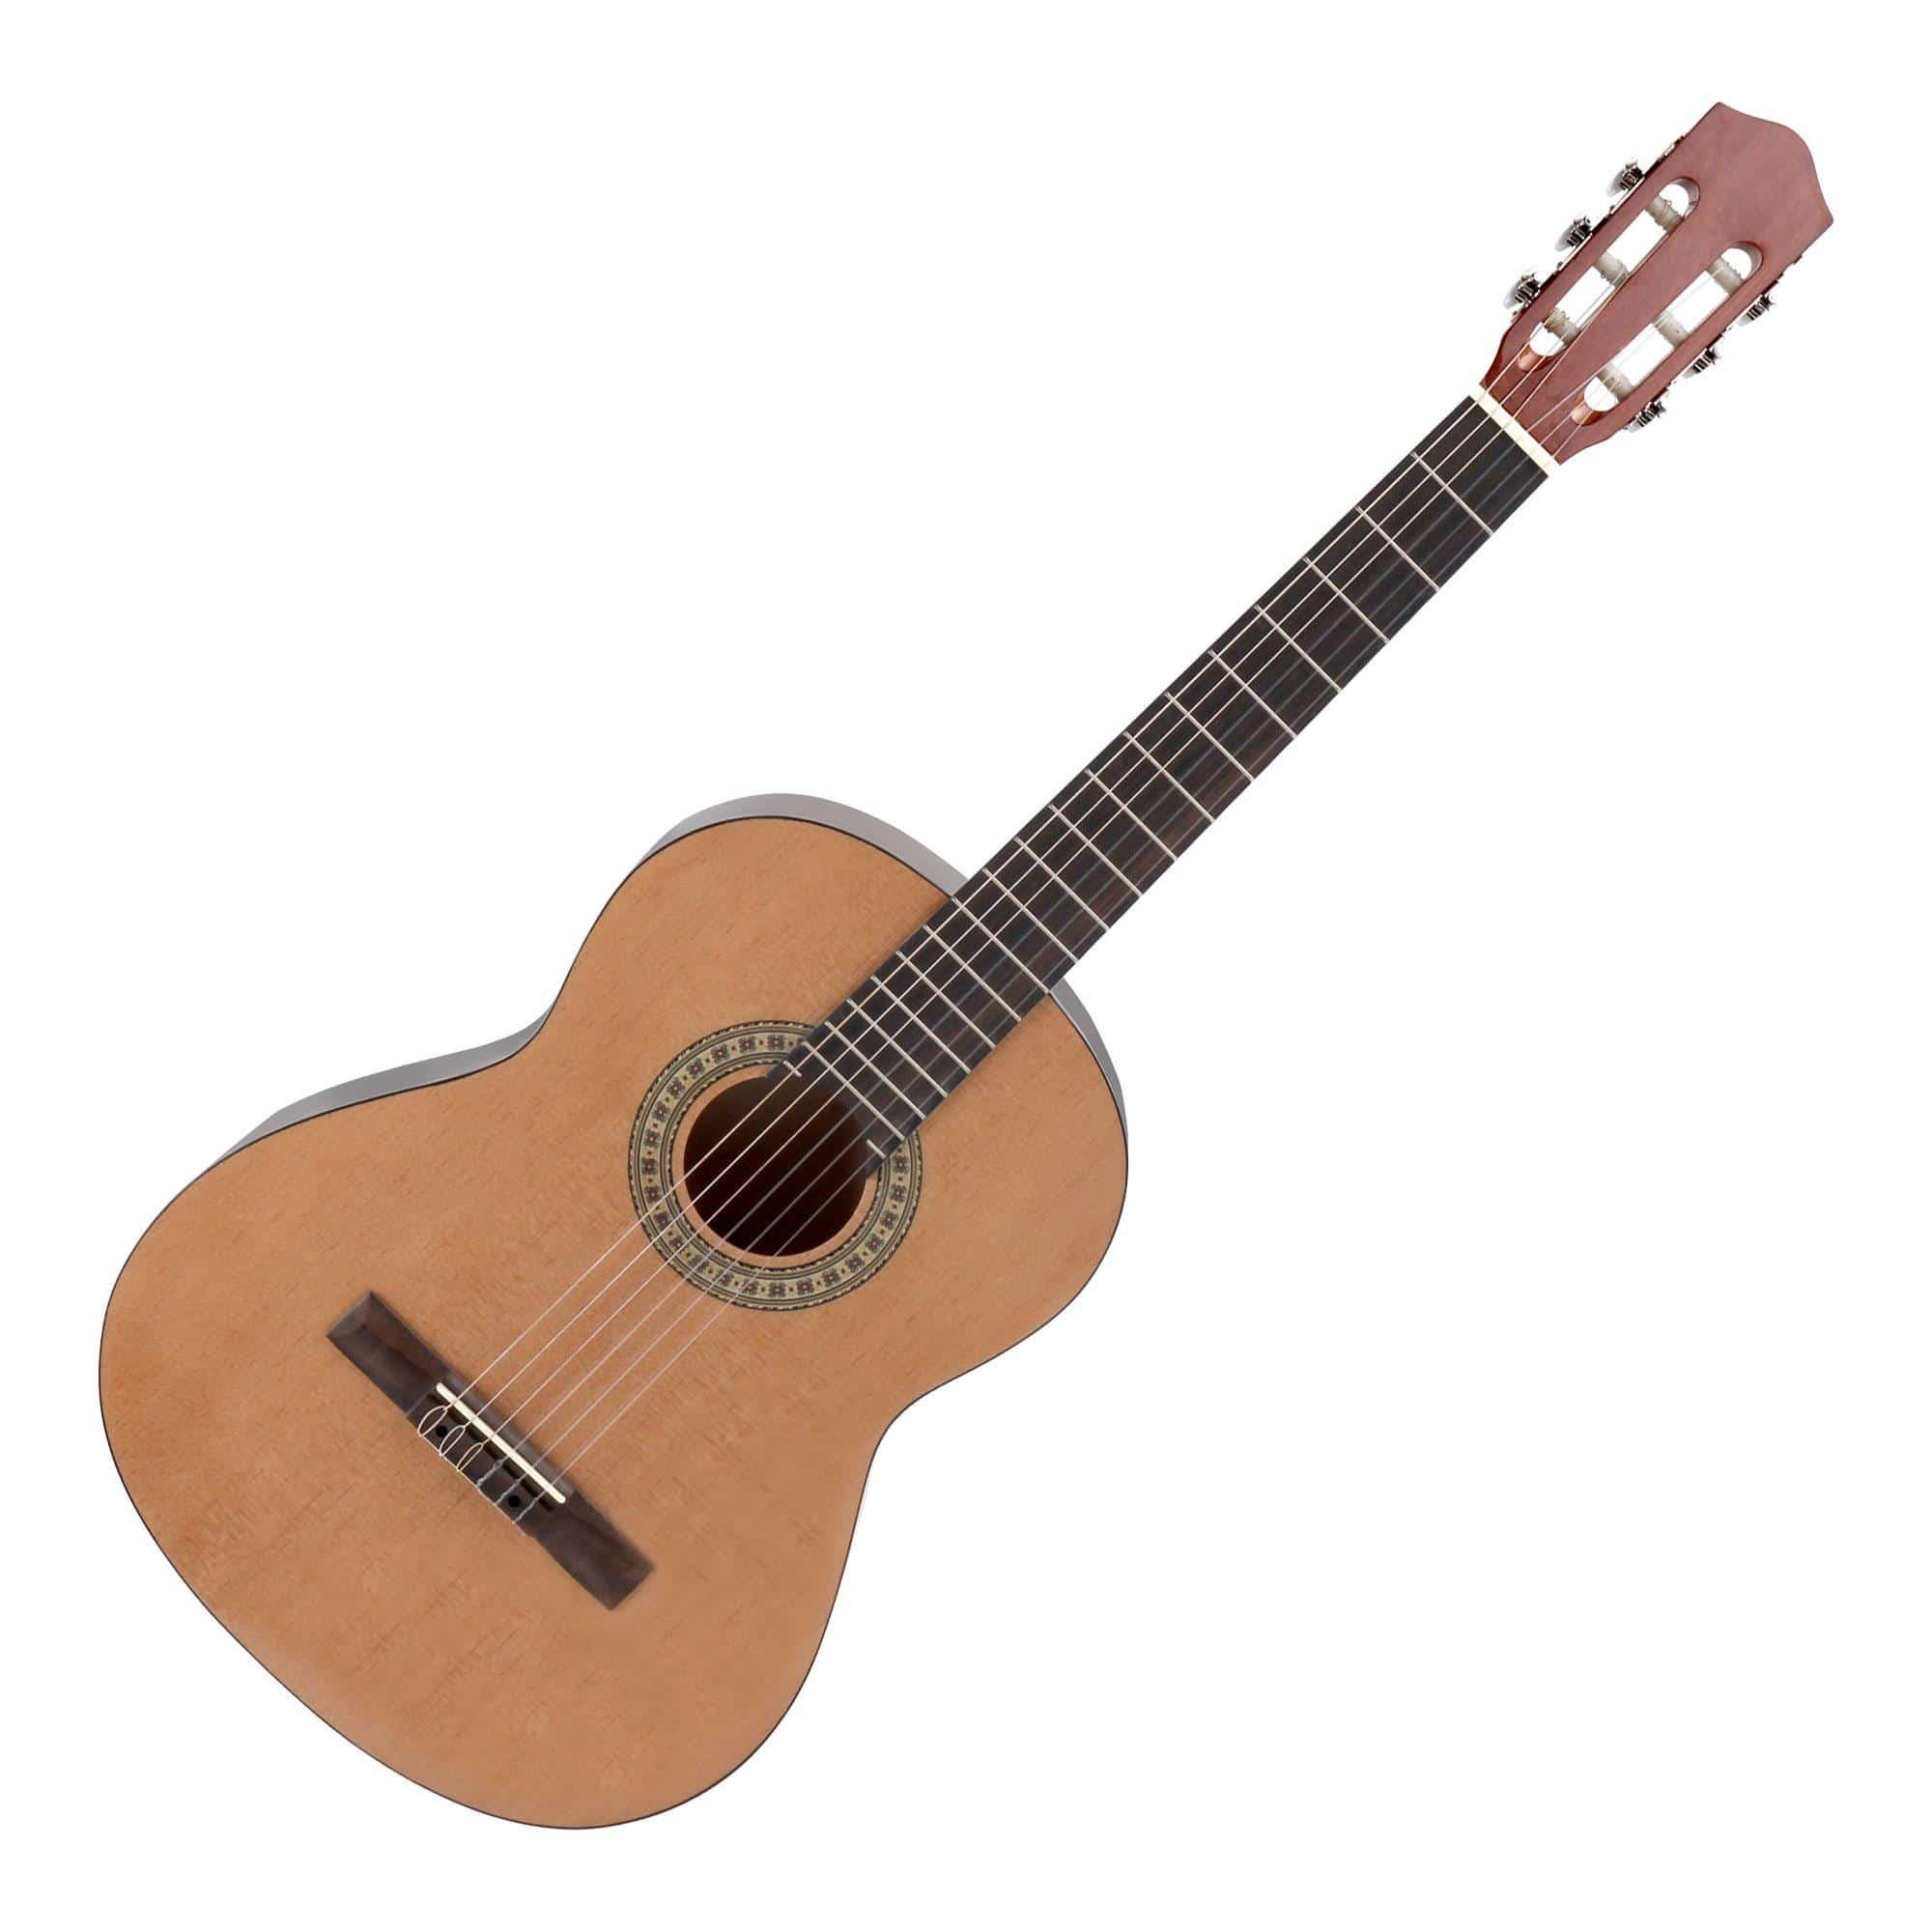 Calida Loretta Konzertgitarre 7|8 natur